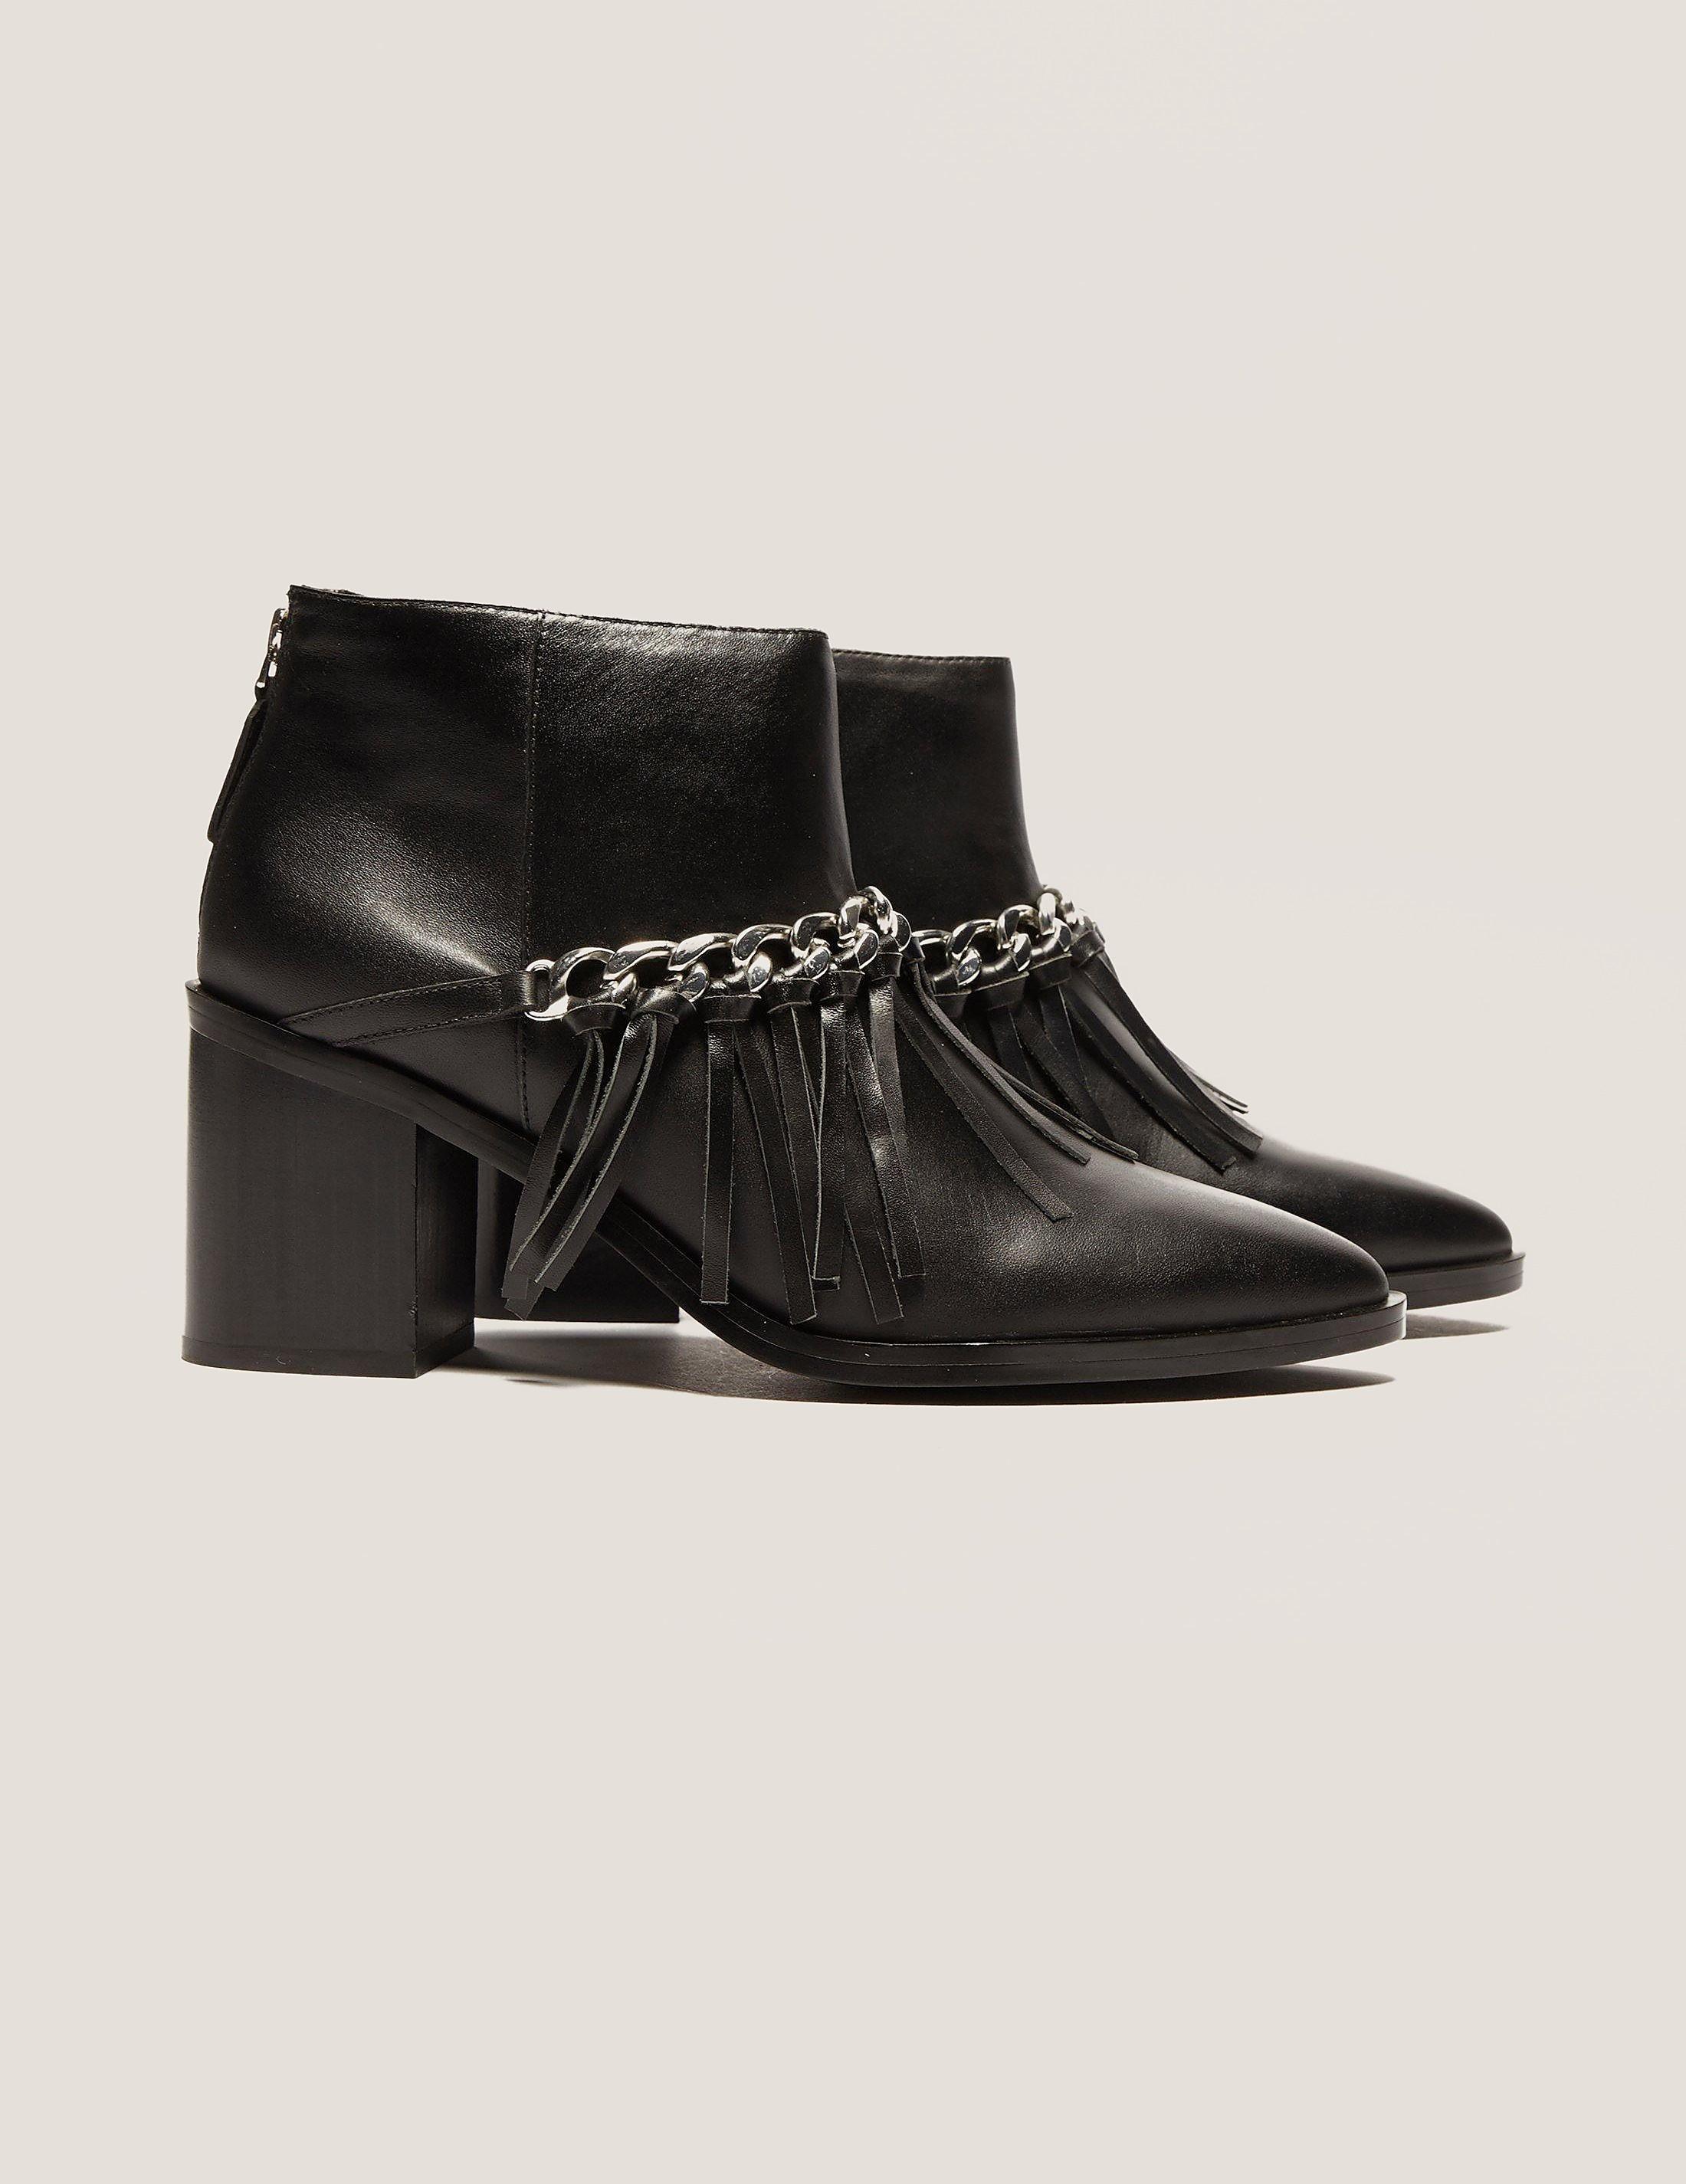 Senso Chain Tassle Boot